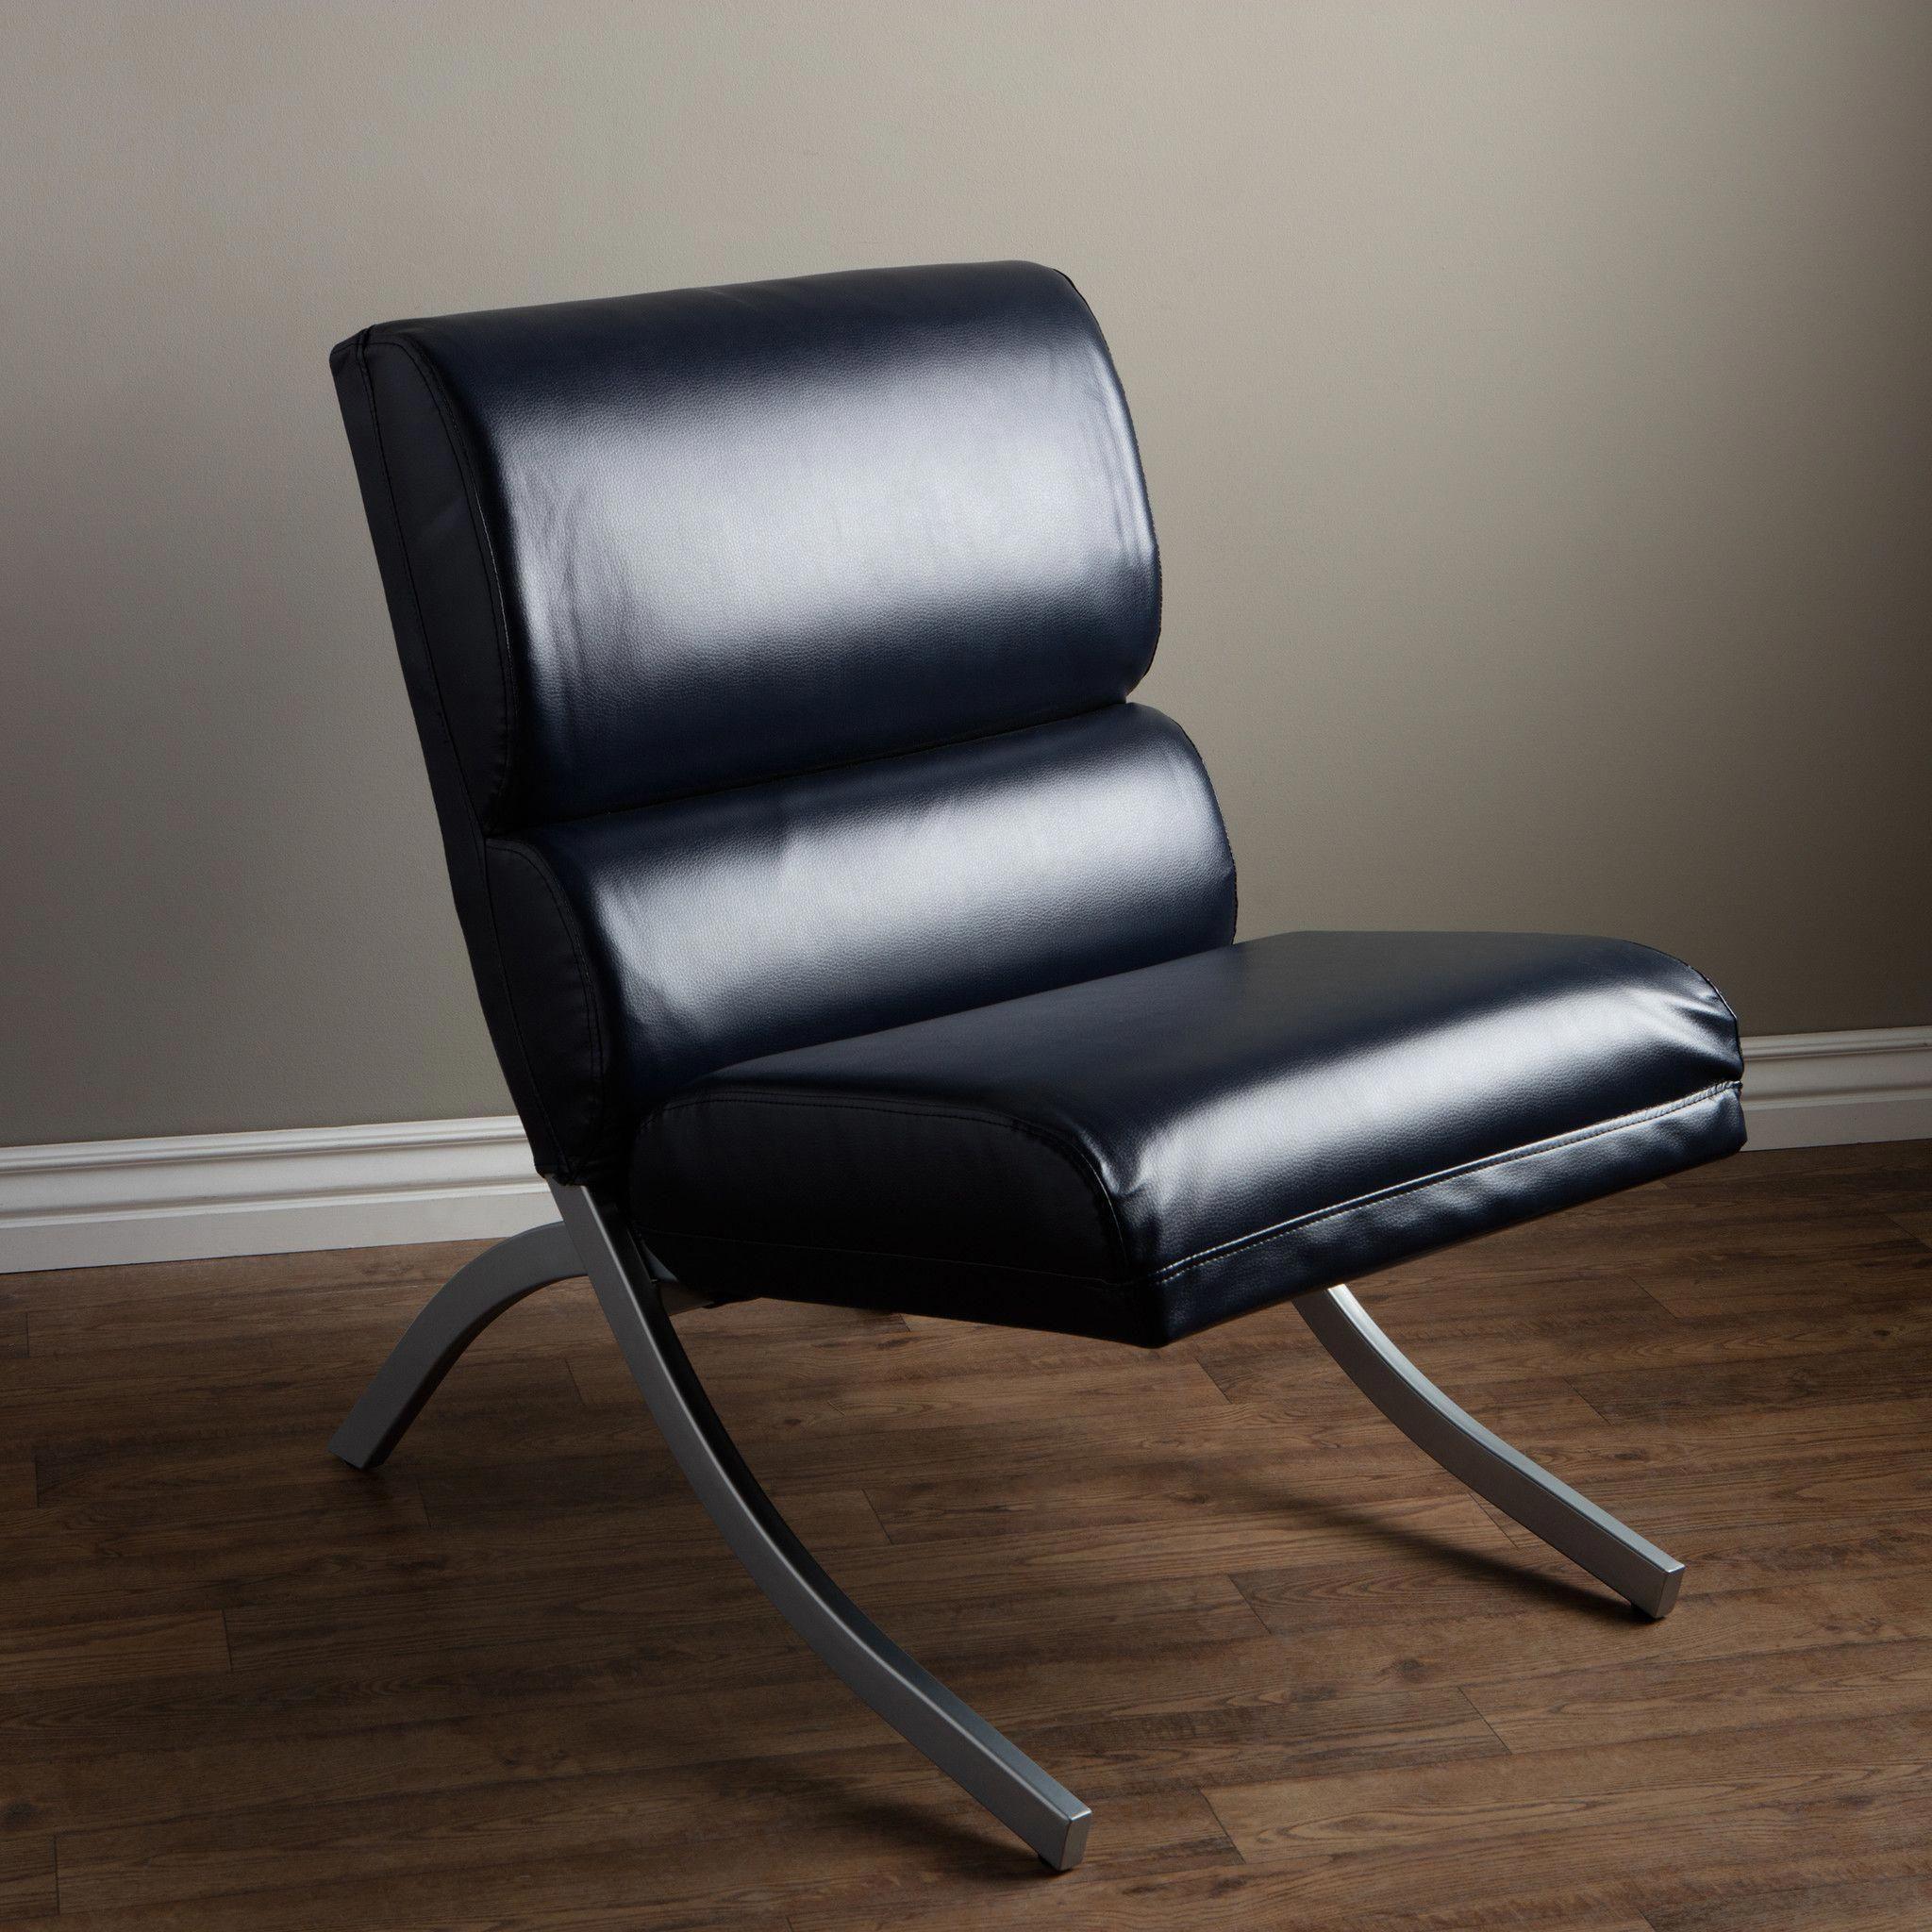 Sensational Retro Mid Century Modern Vintage Lounge Bonded Leather Machost Co Dining Chair Design Ideas Machostcouk